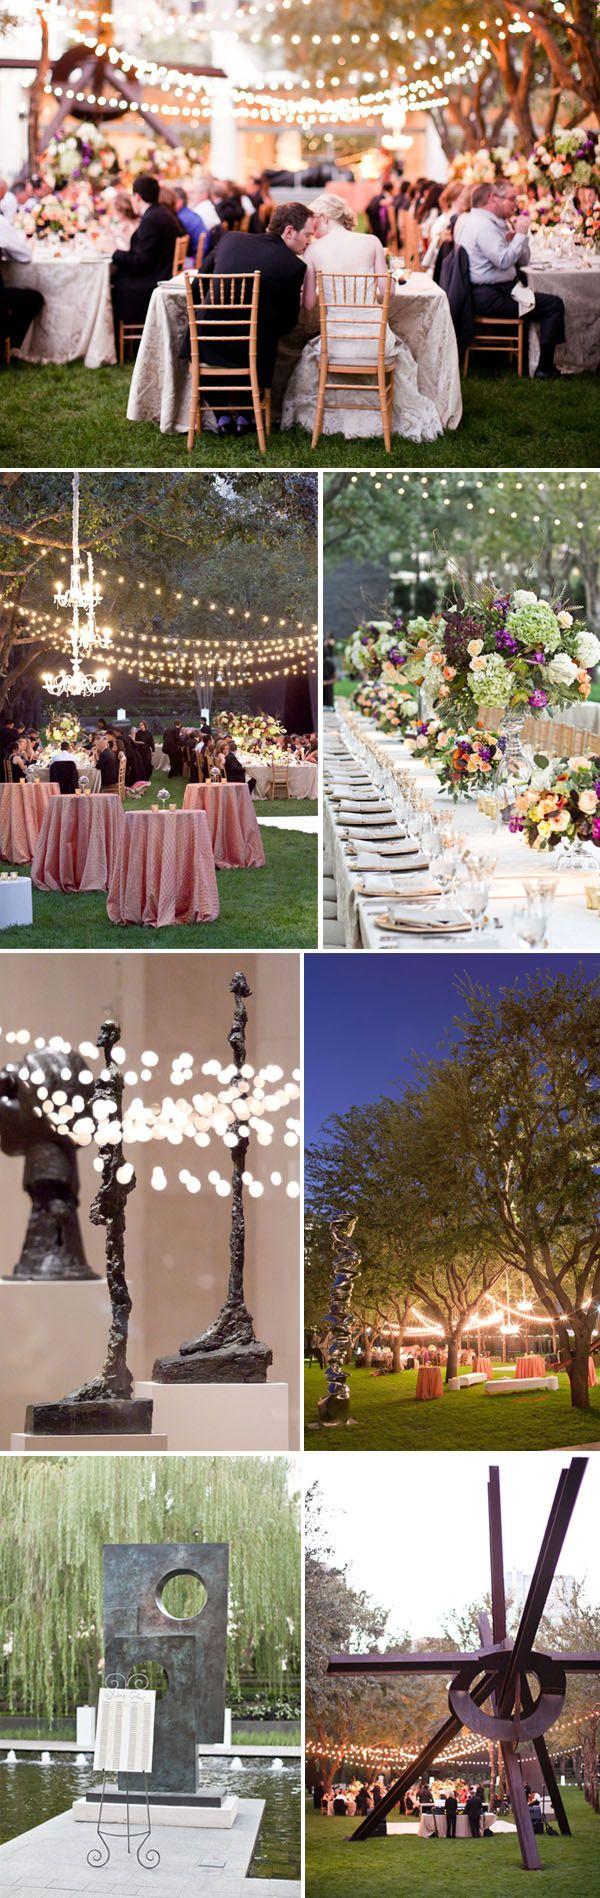 outdoor wedding venues dfw texas%0A Dallas Wedding At Nasher Sculpture Garden   Strictly Weddings